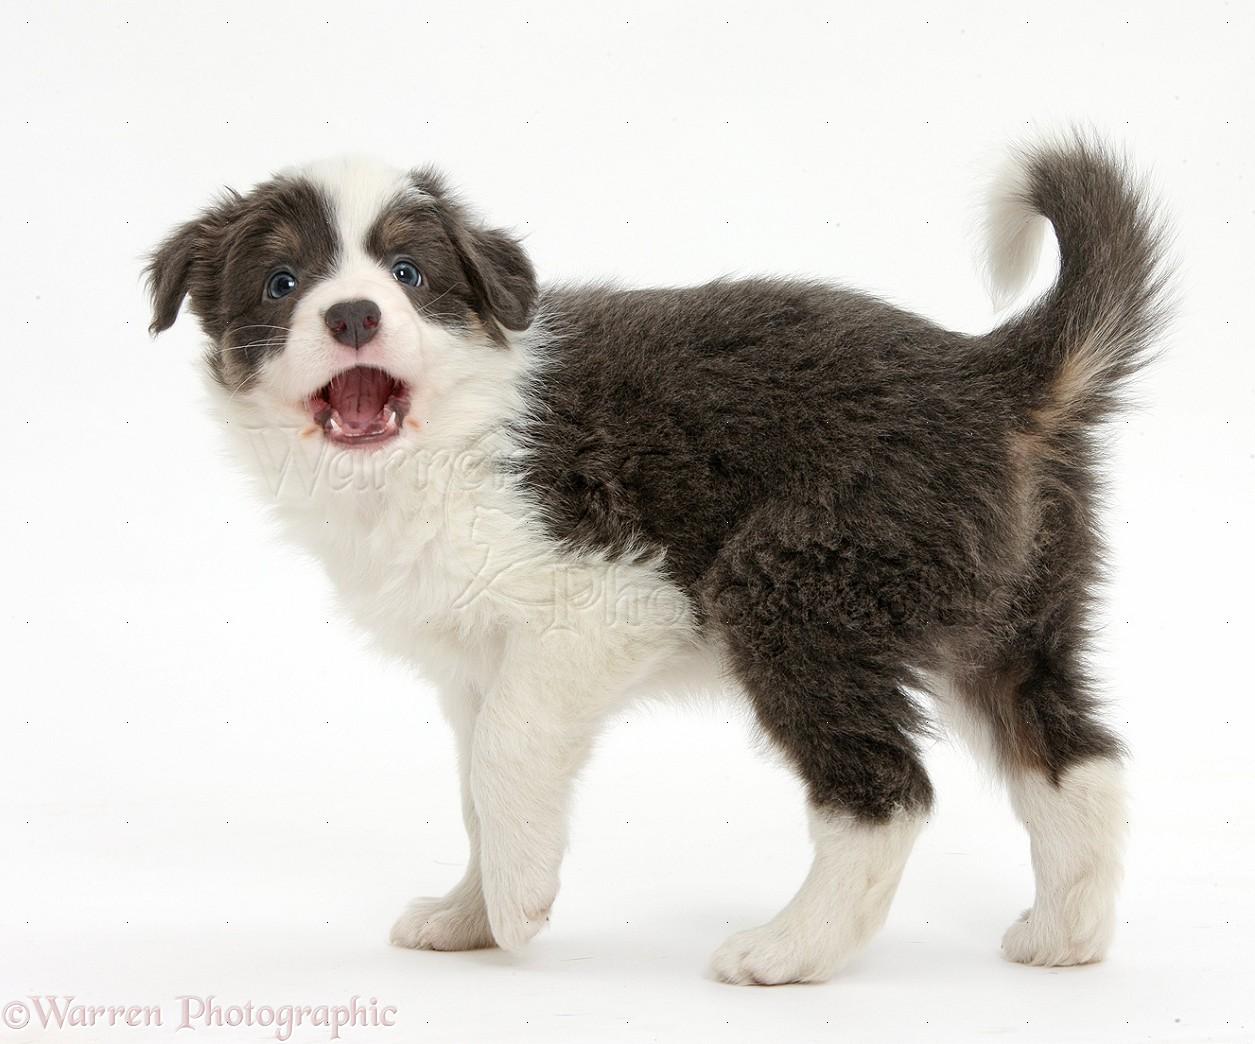 Dog blue and white border collie pup barking photo wp39519